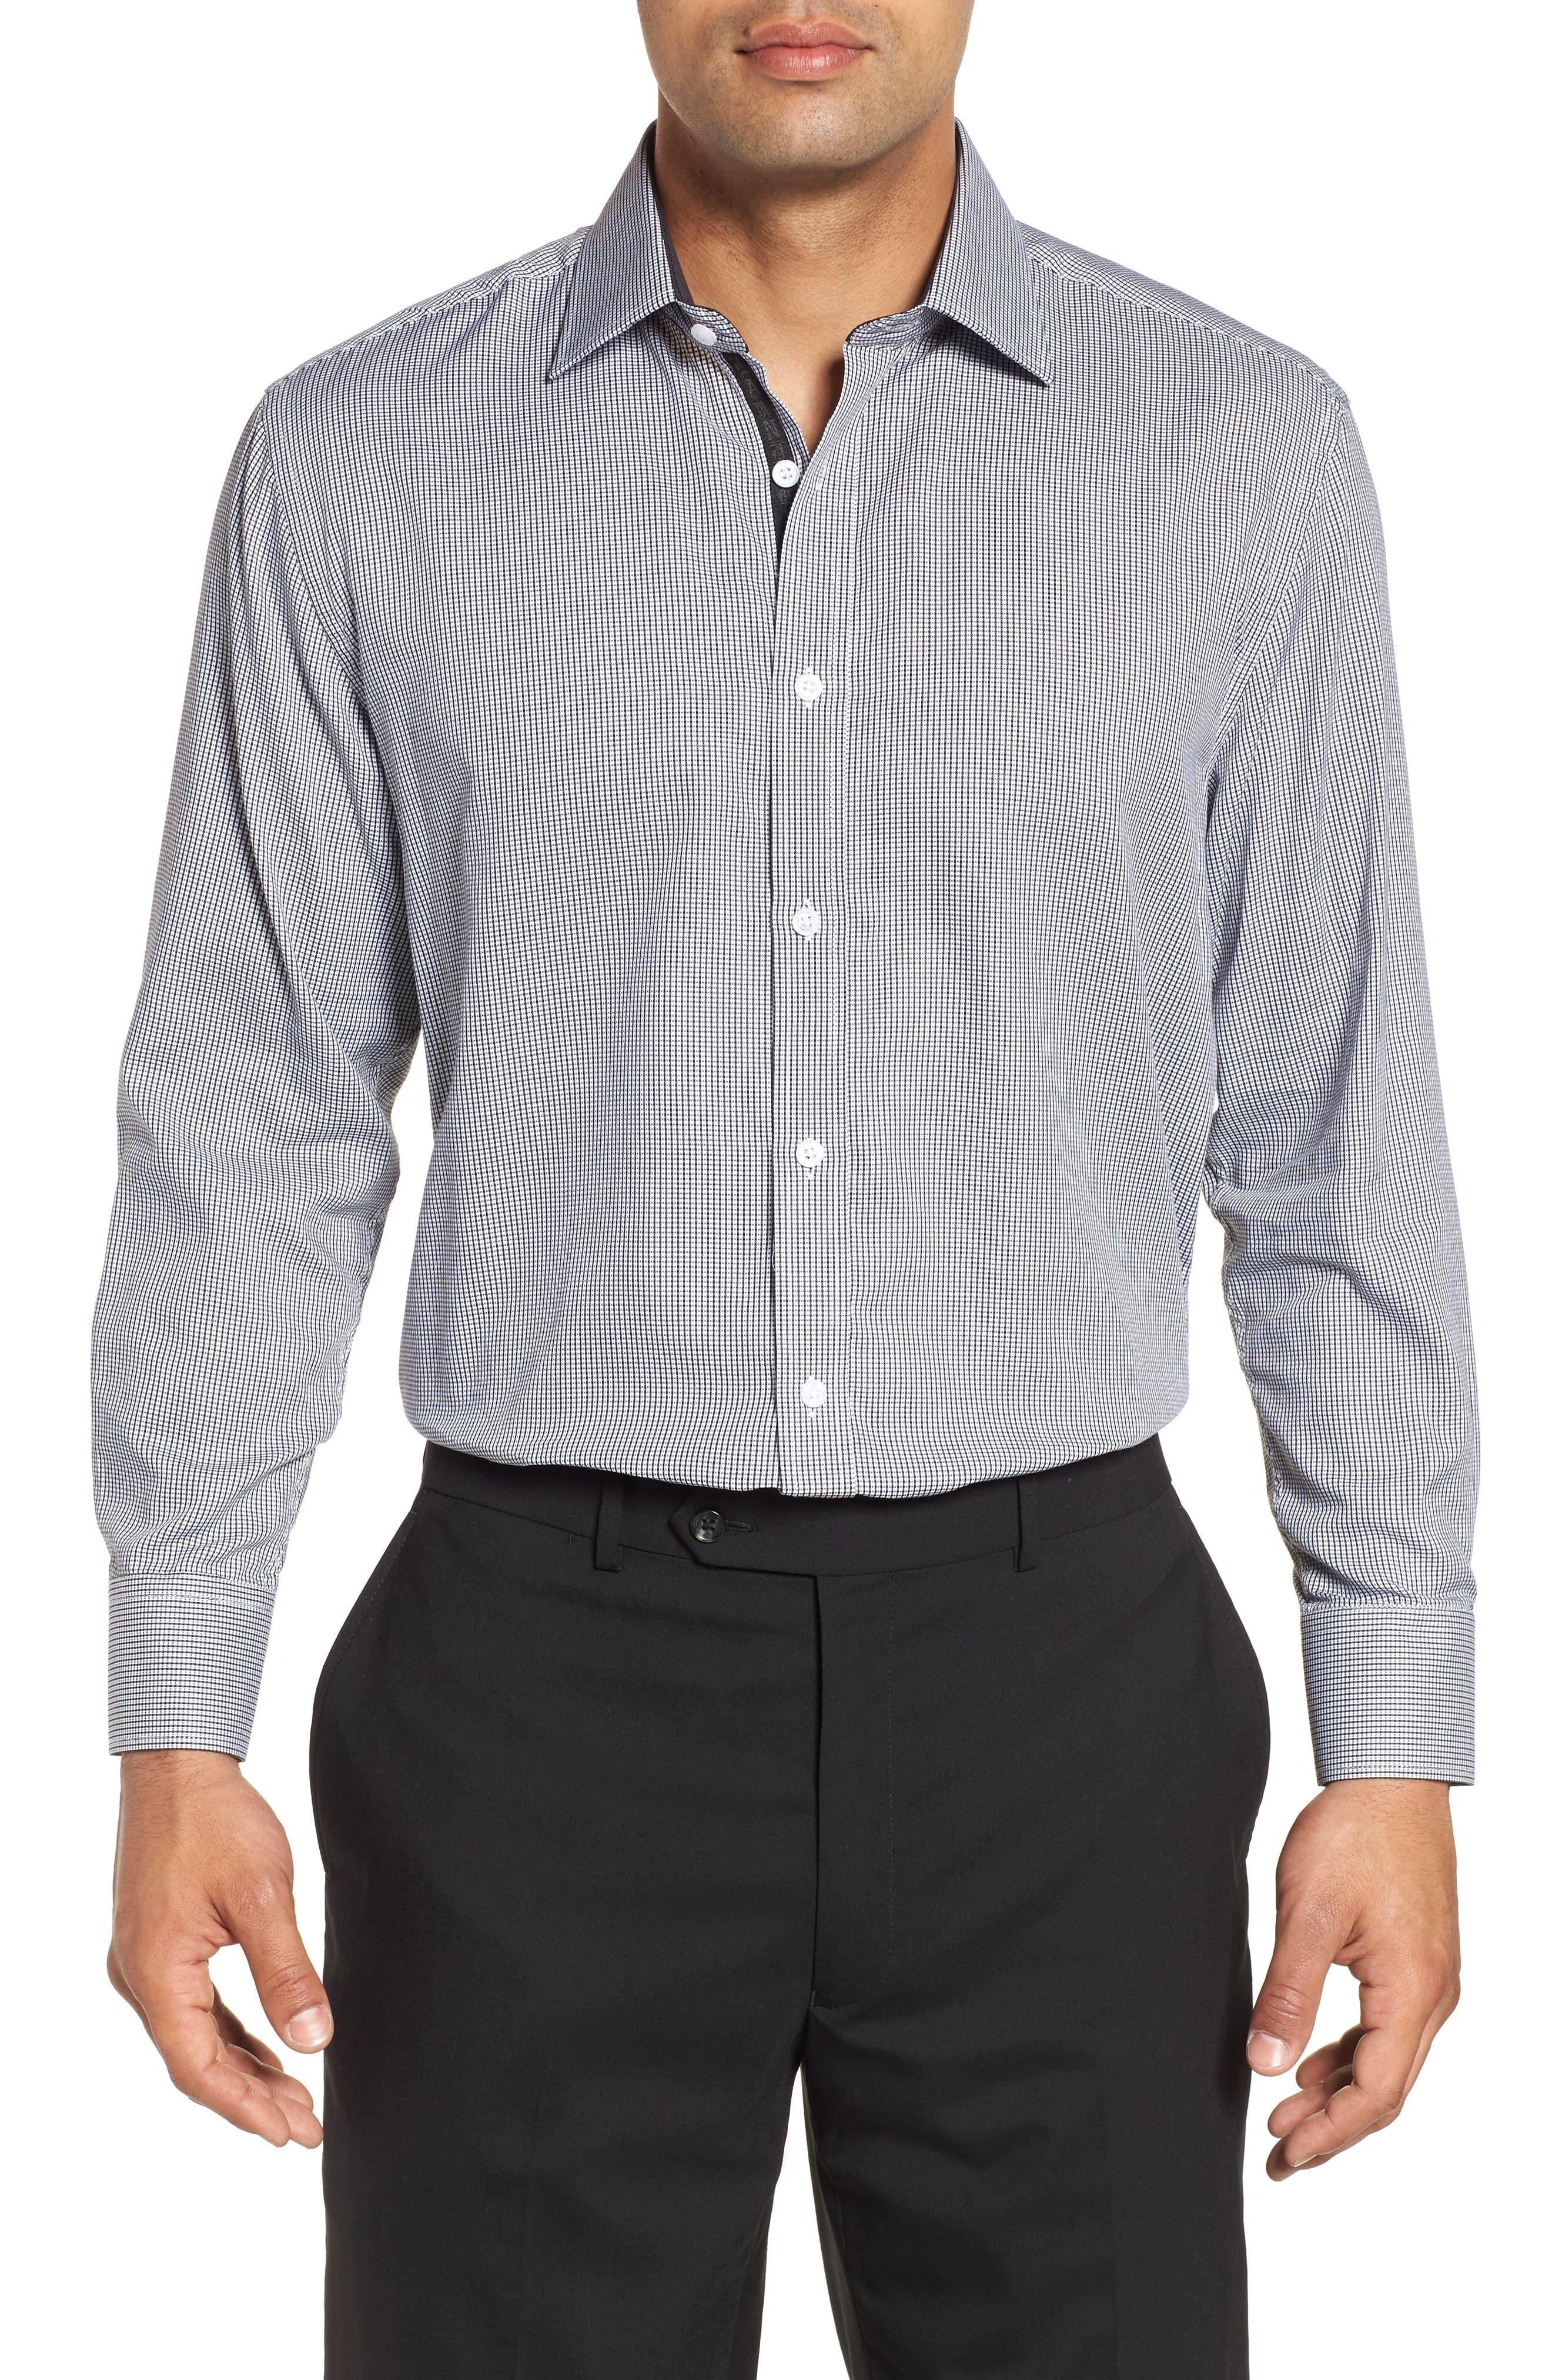 ENGLISH LAUNDRY Regular Fit Check Dress Shirt, Main, color, 001